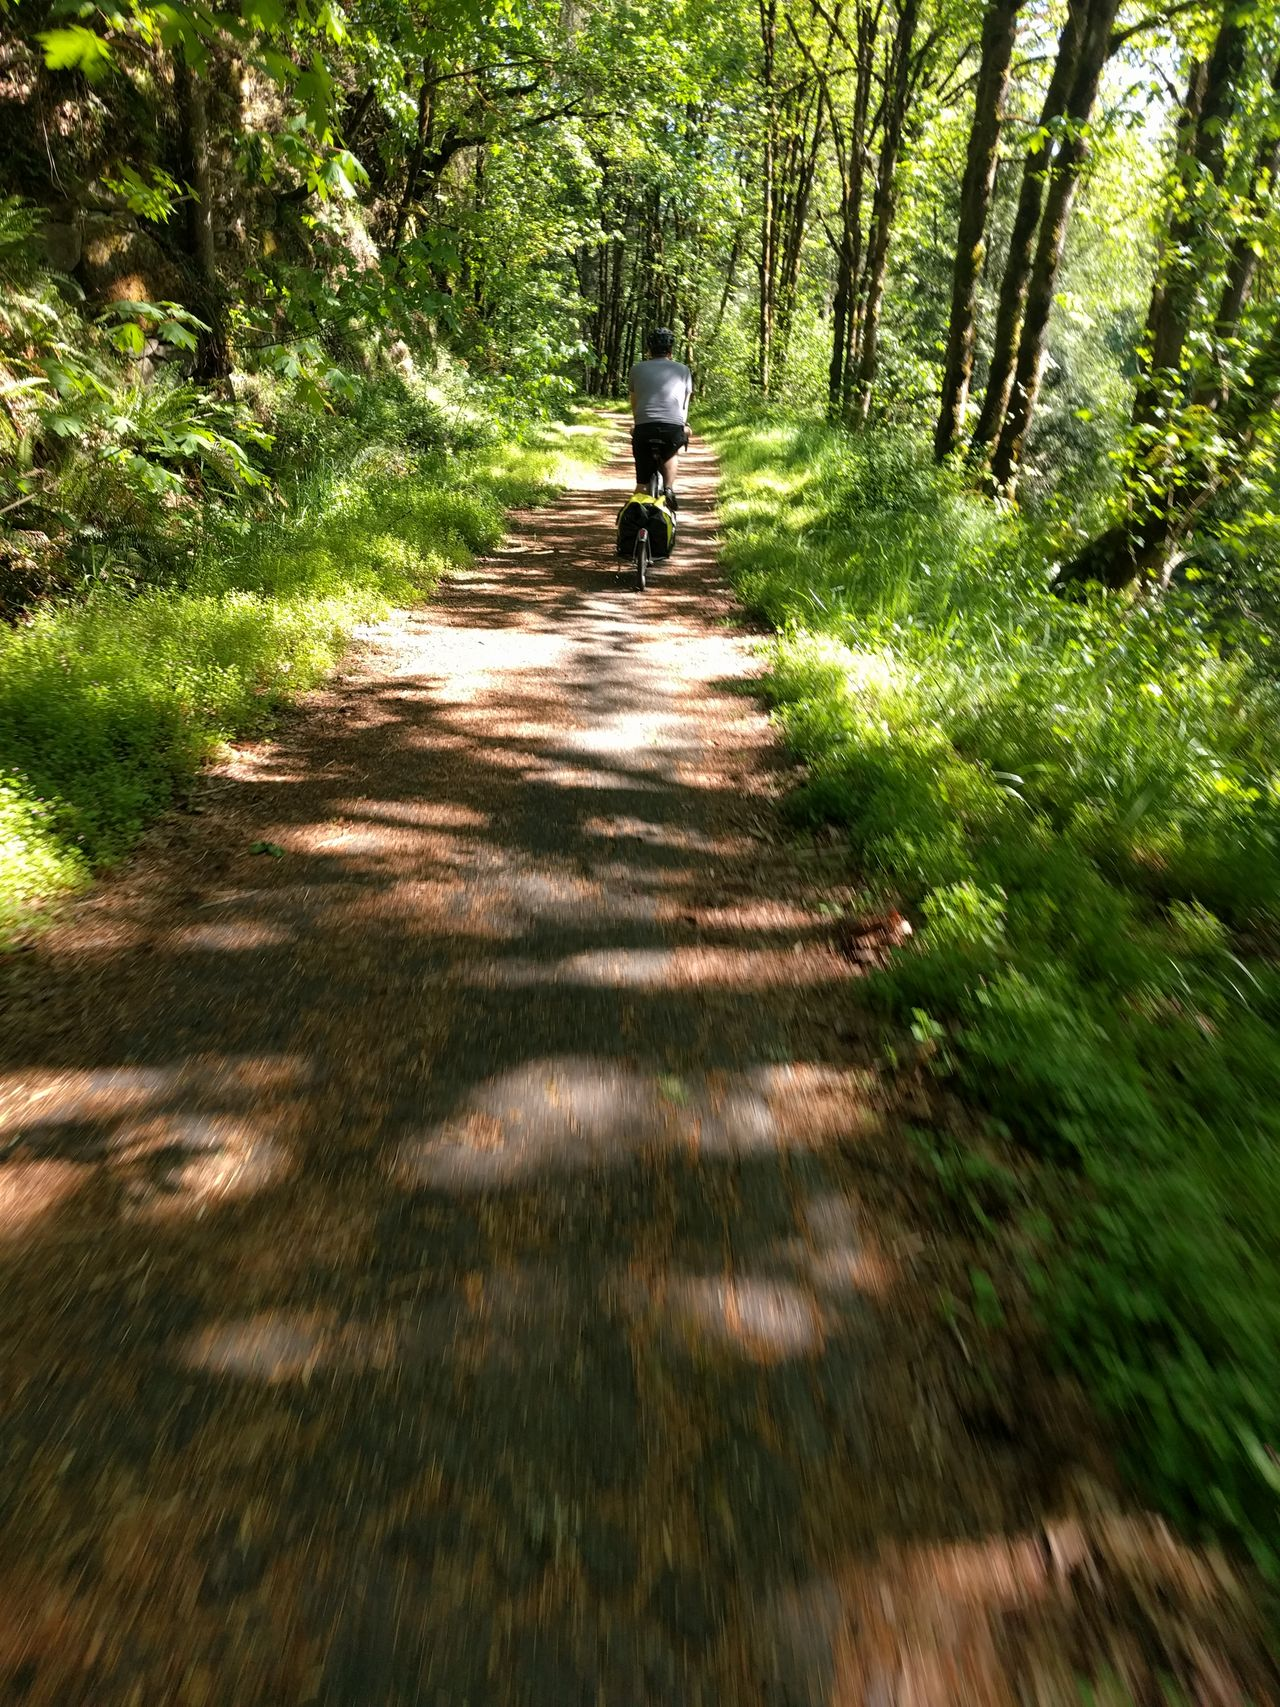 Bicyclist Bike Path Bike Trail Gravel Path Gravel Road Multi-use Path Trail